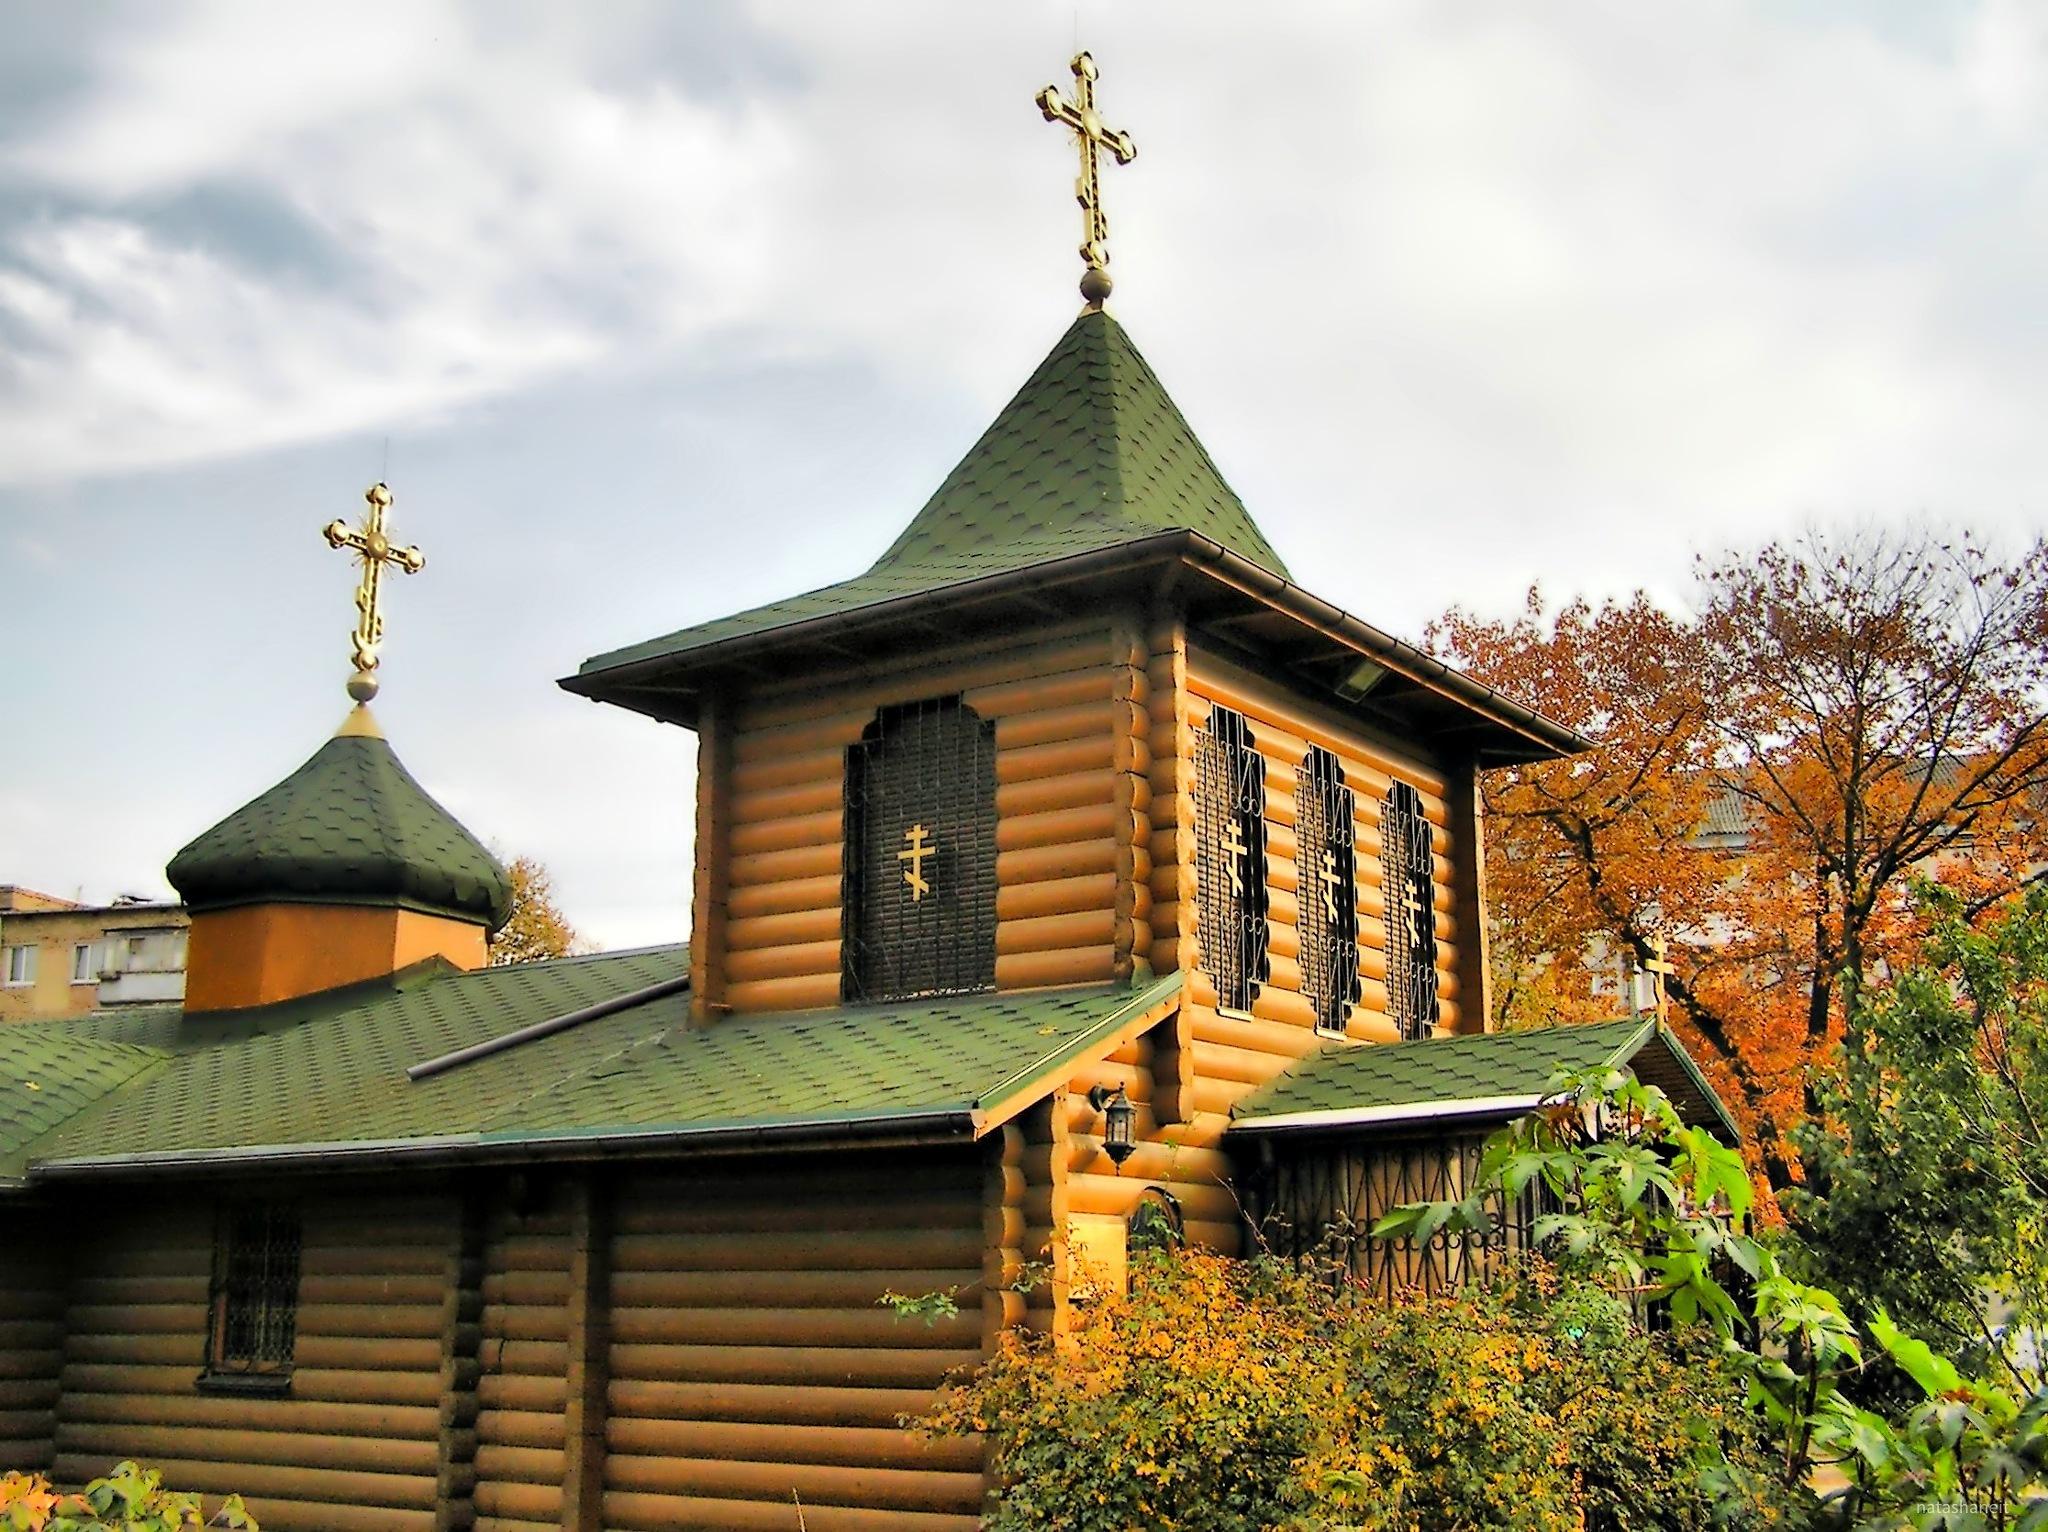 Little church in the park by natashaneit